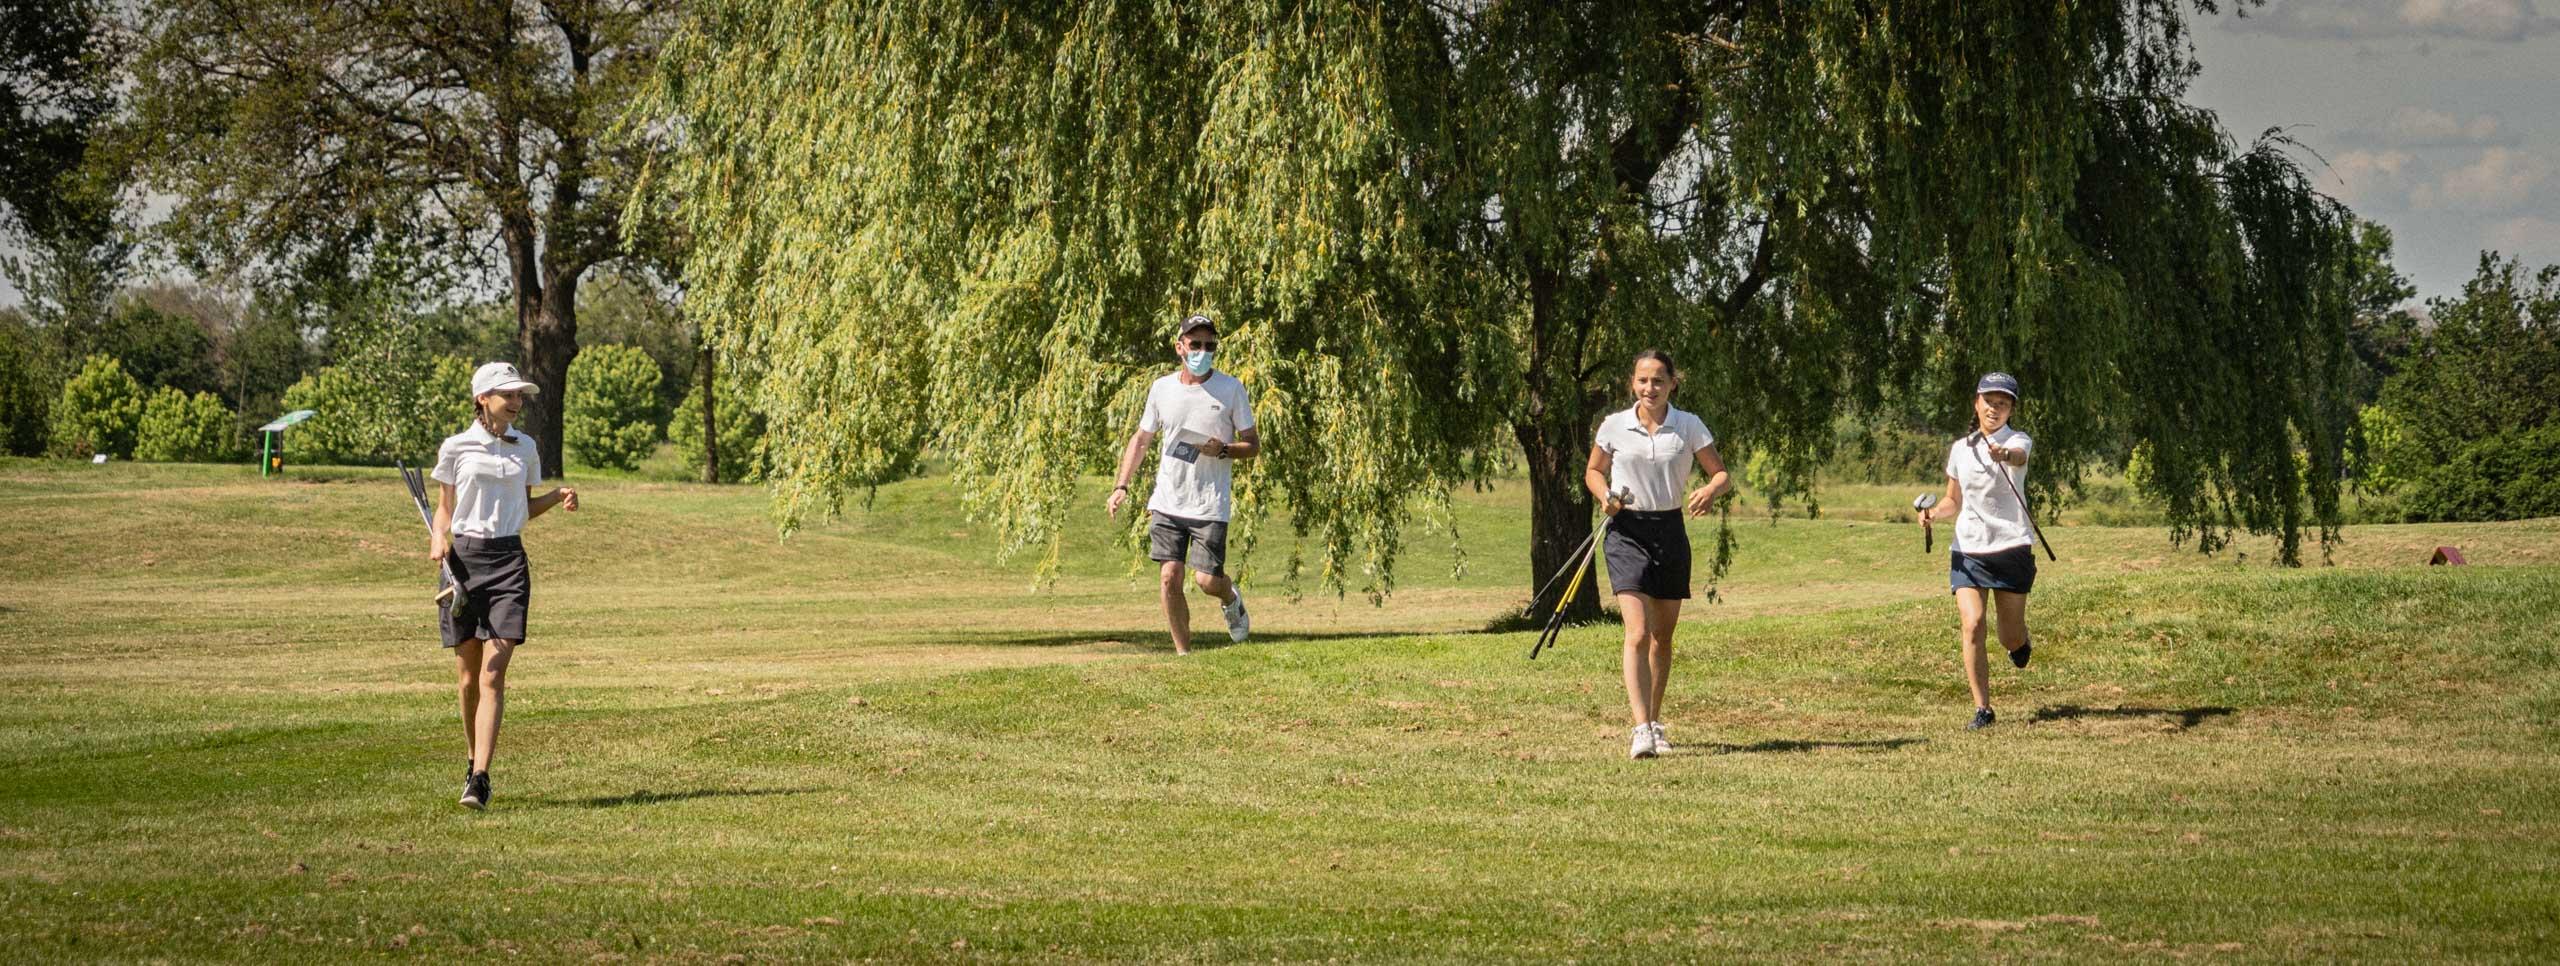 Speed Golf 2021 Edg Etangs Loire Haute Loire 8